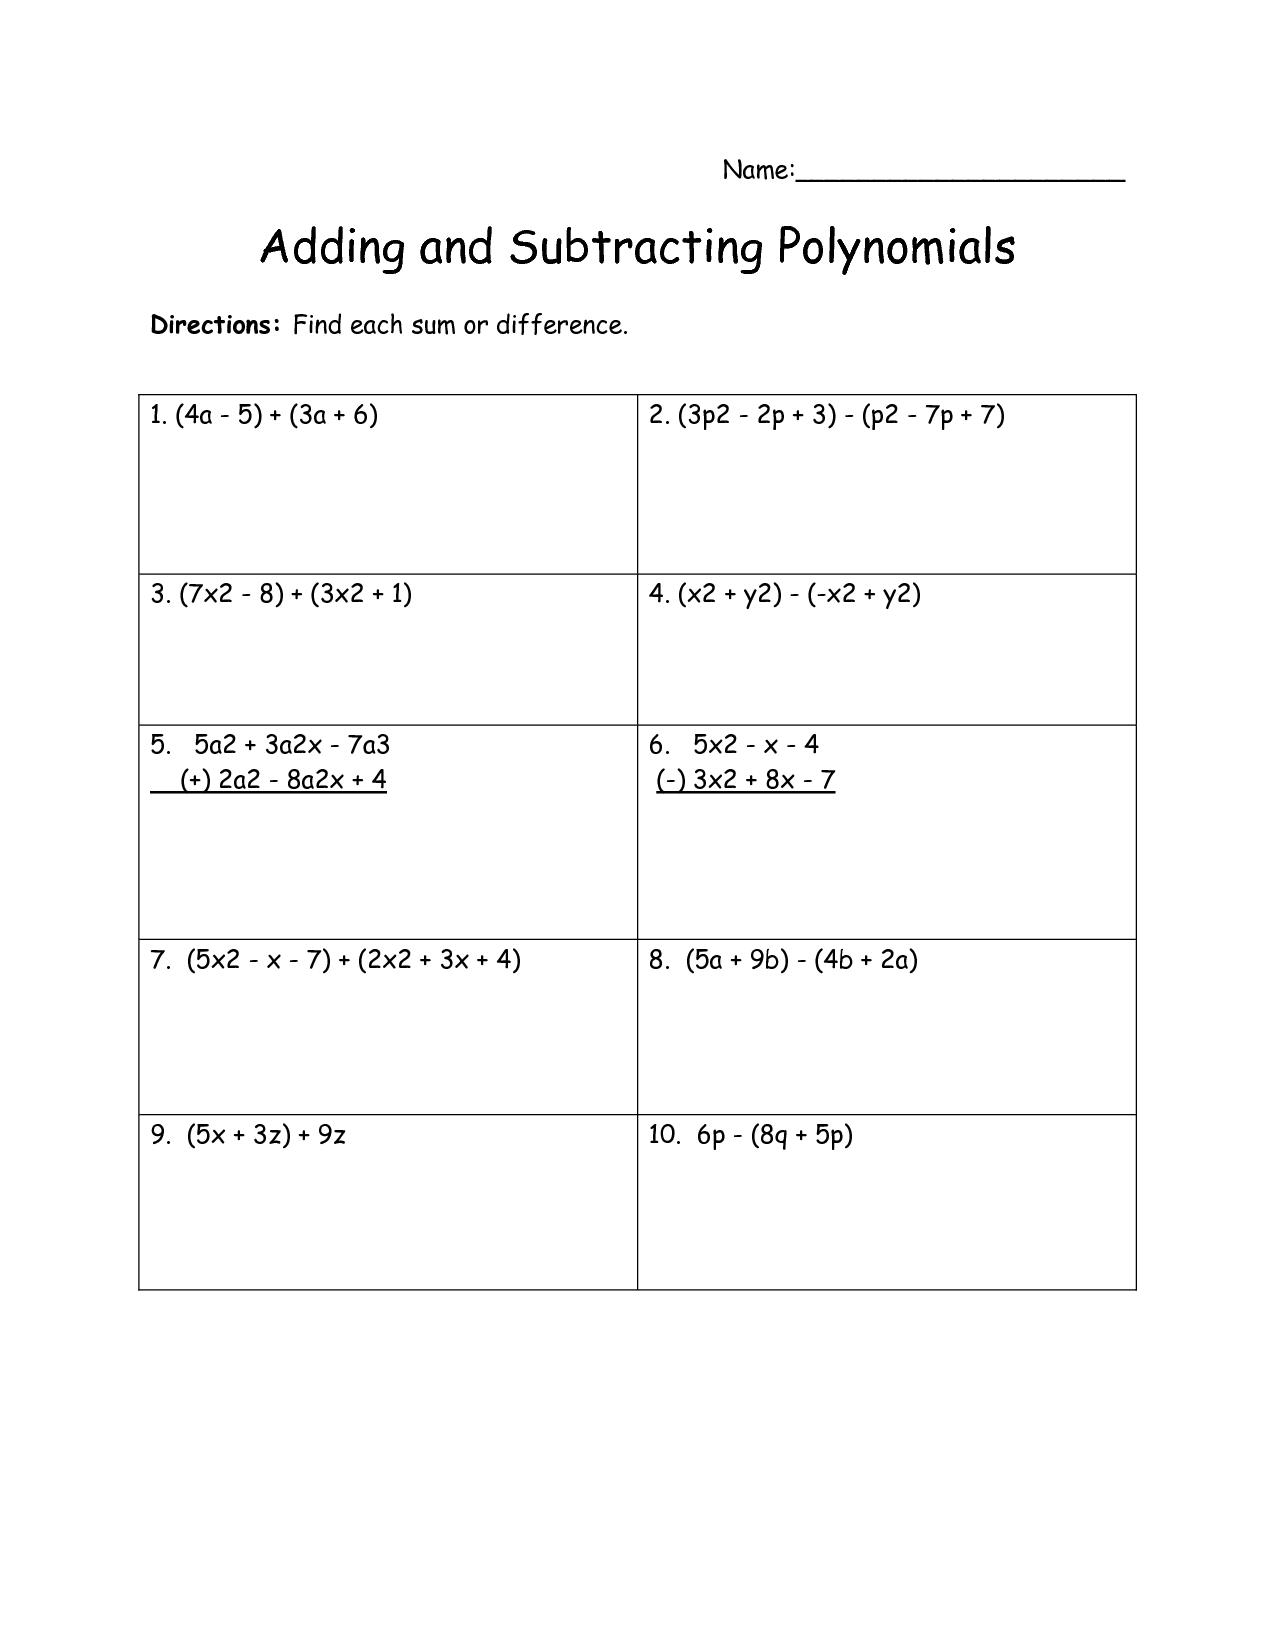 Adding Polynomials Worksheet Fun